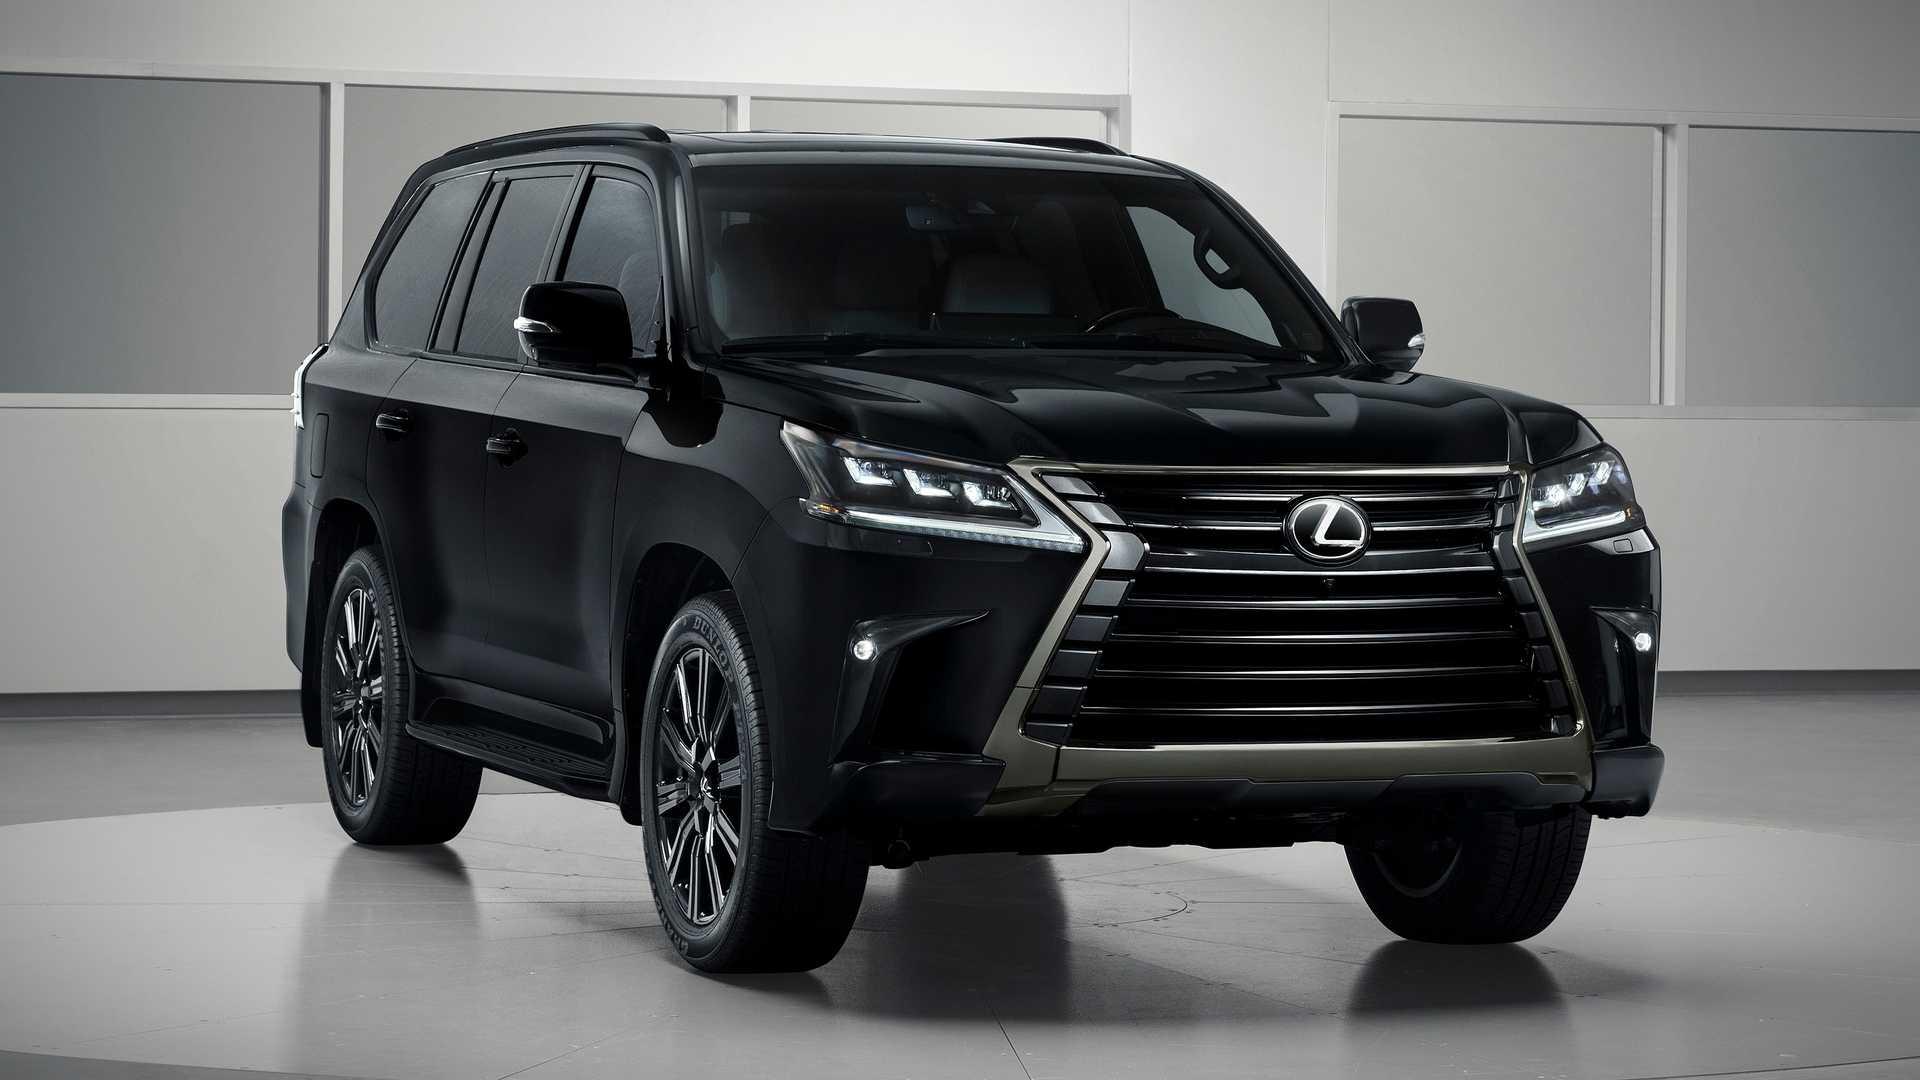 Lexus LX 570 Inspiration